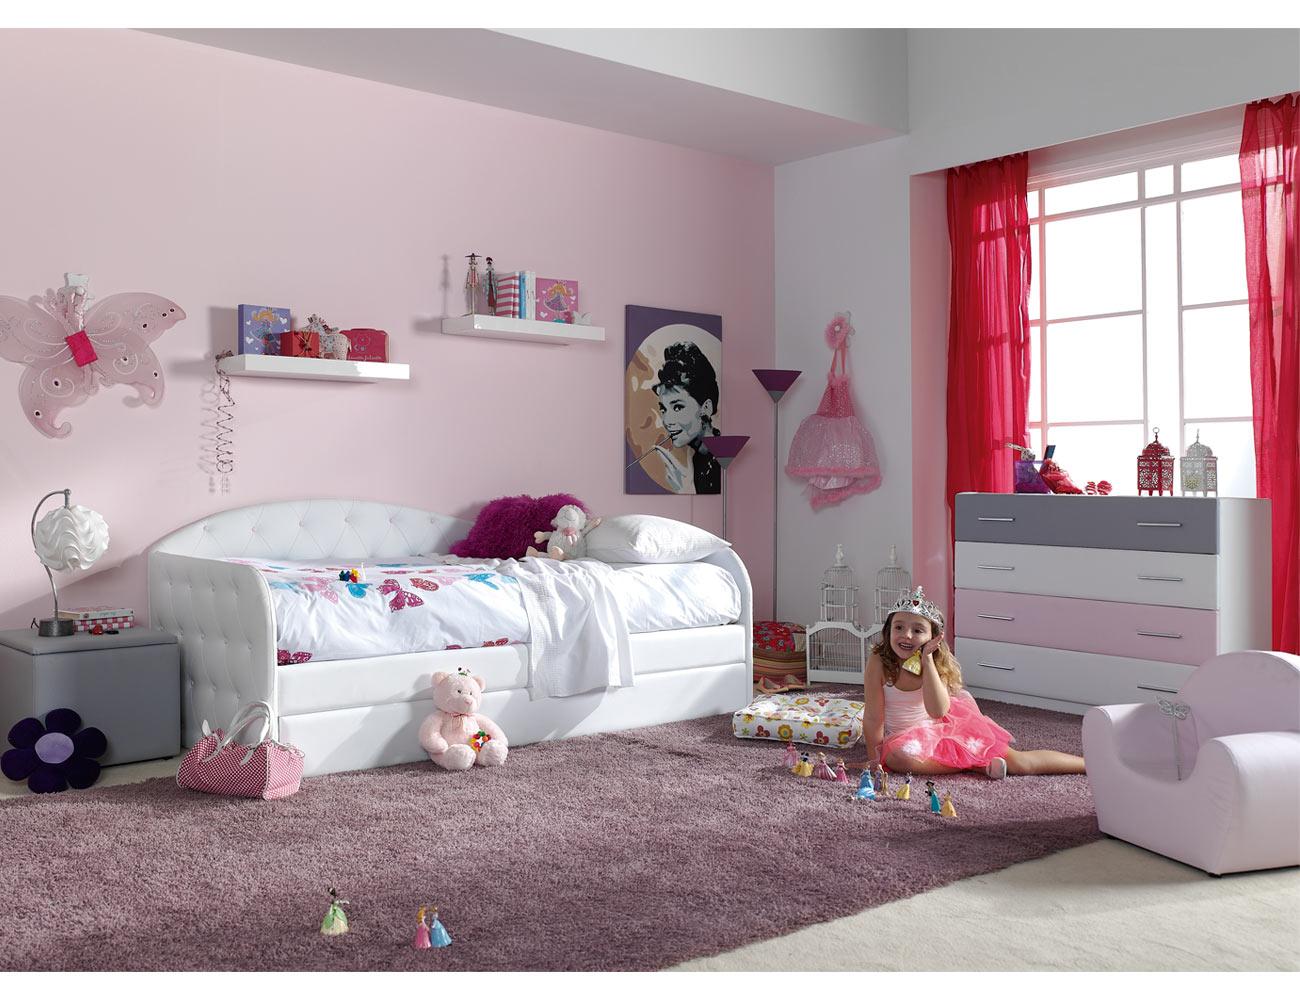 243 cama nido2